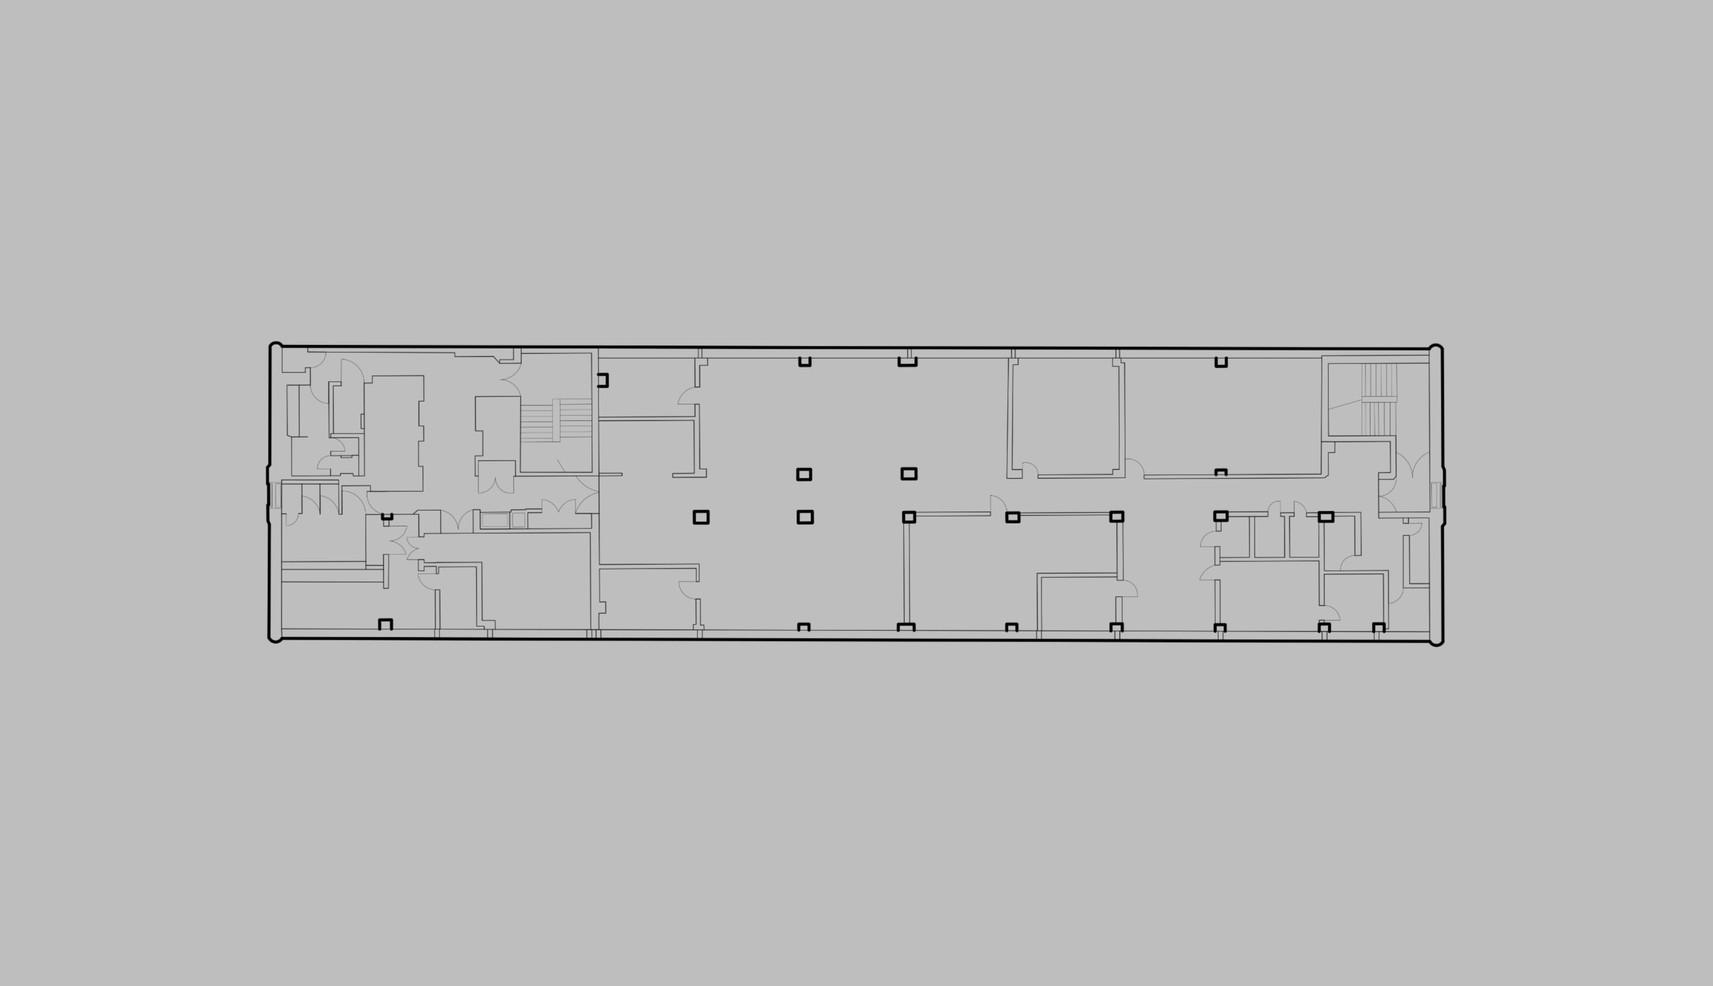 1ST-10TH FLOOR PLAN